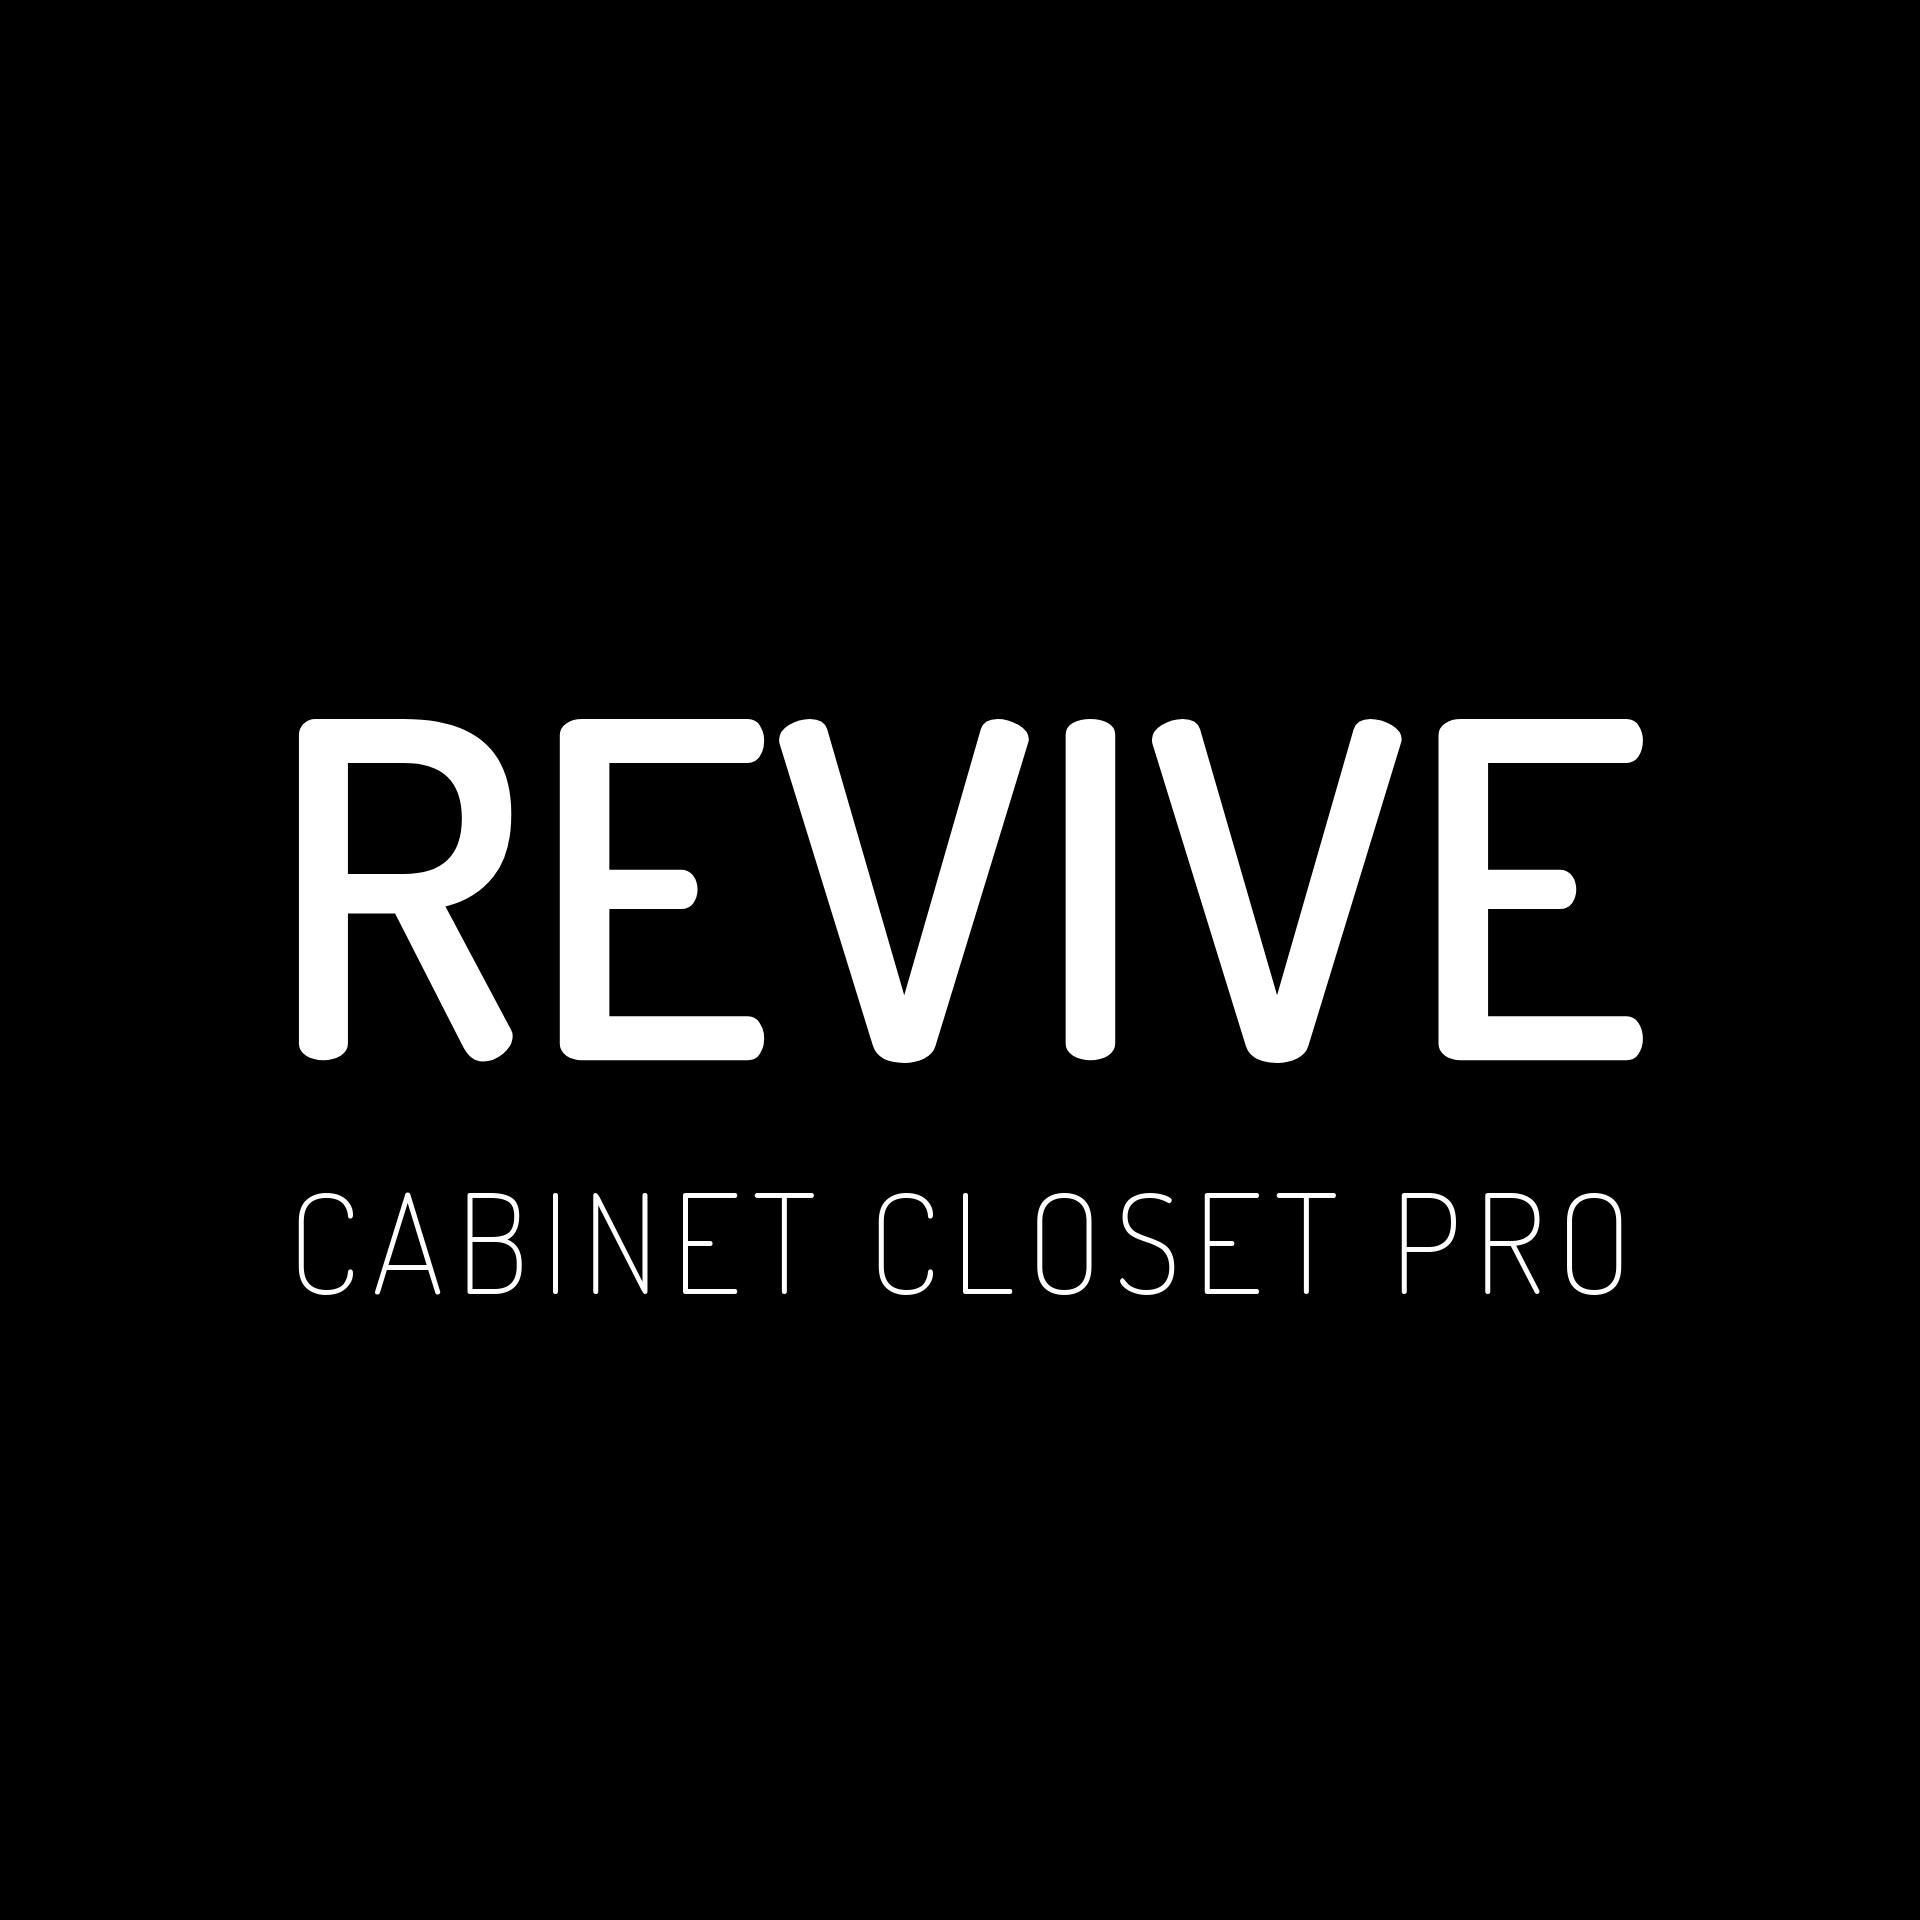 Cabinet Closet Pro